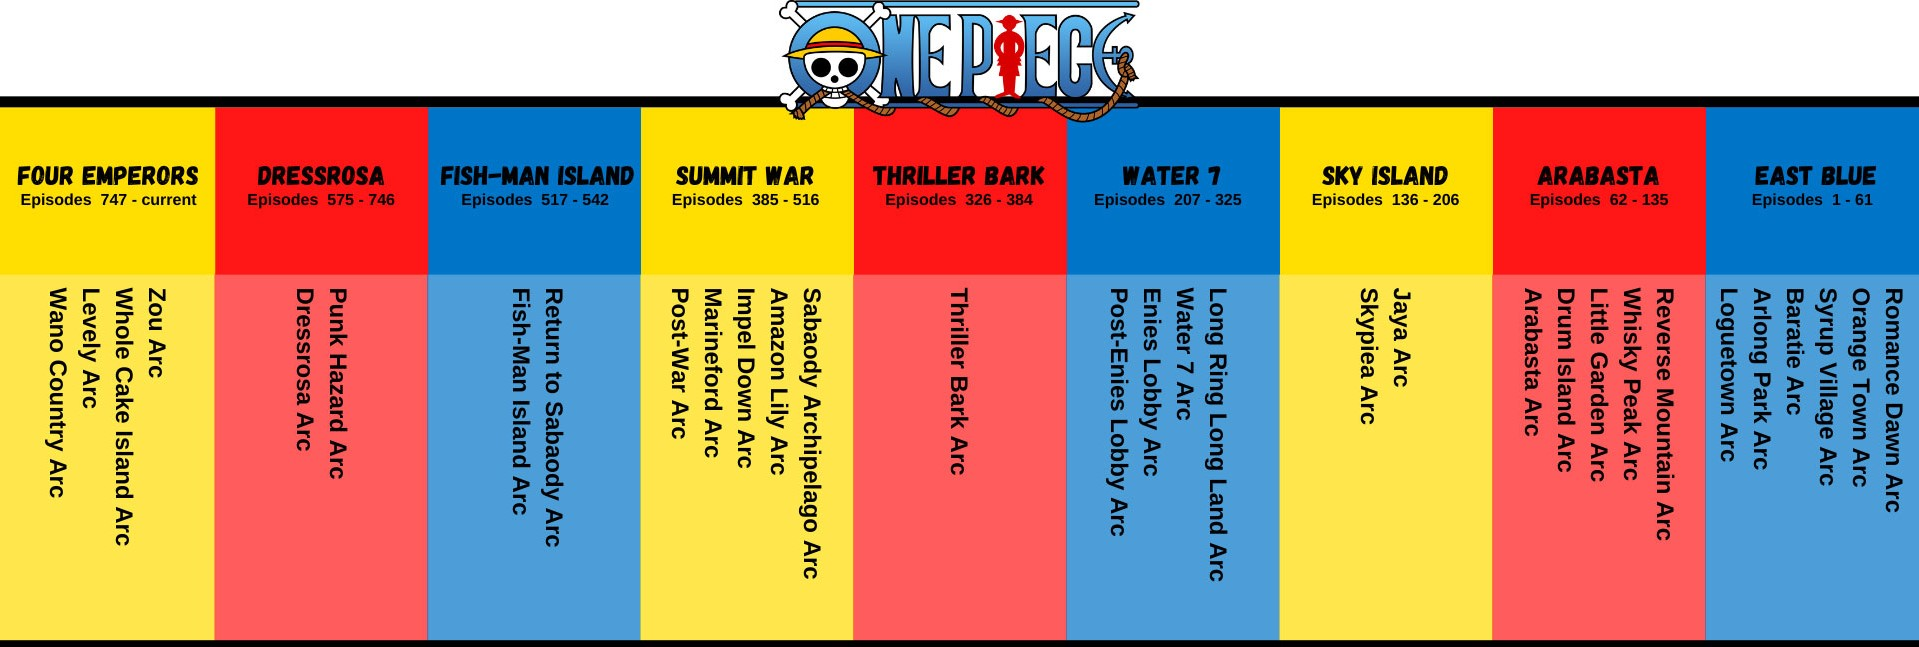 One-Piece-Arcs-and-Sagas